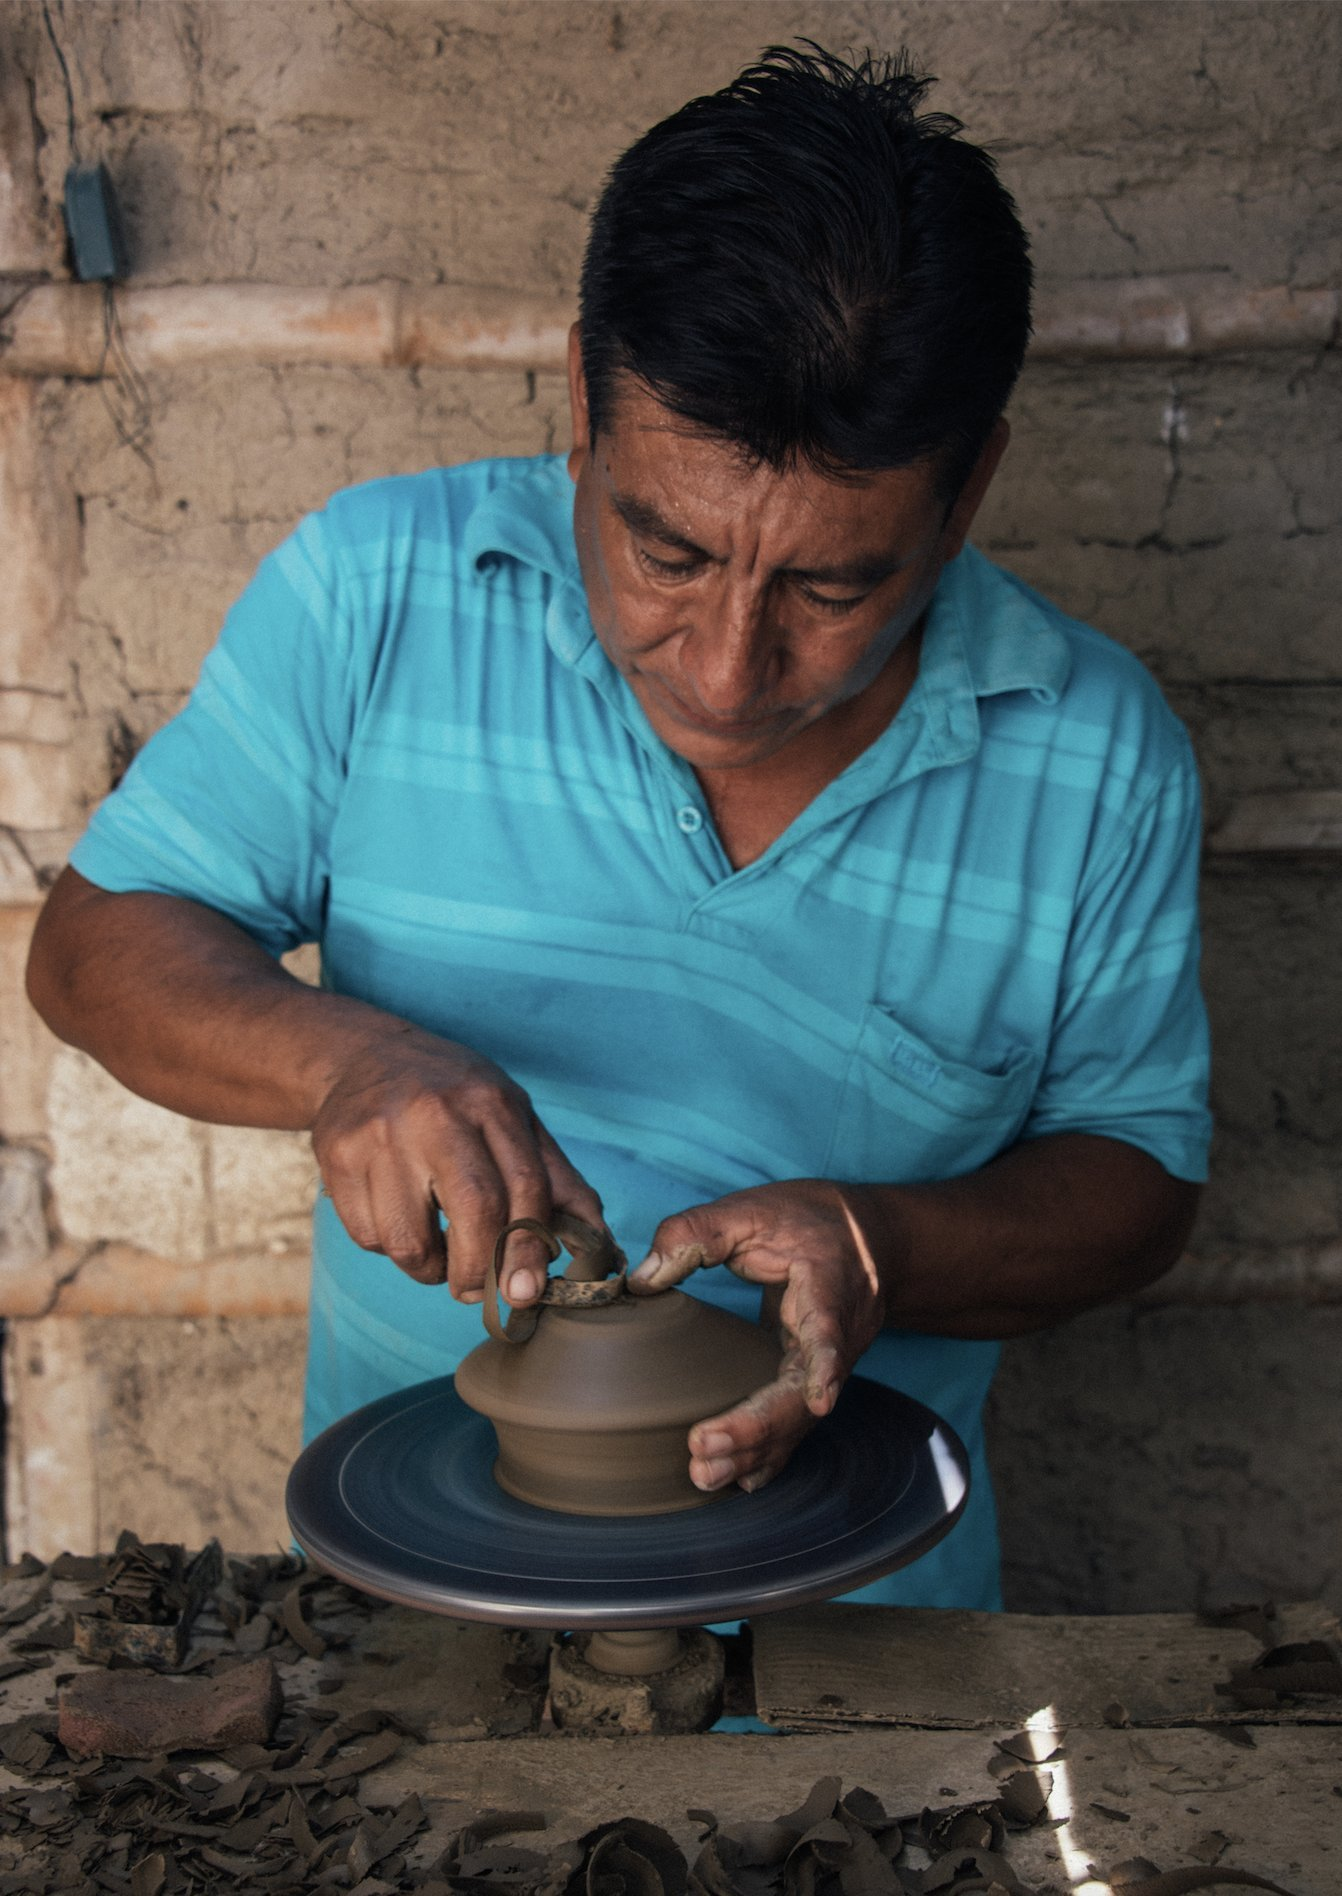 Luna Sundara Palo Santo Holder Authentic Chulucanas Peru Pottery (Green) 5 Palo Santo Sticks Included by Luna Sundara (Image #5)